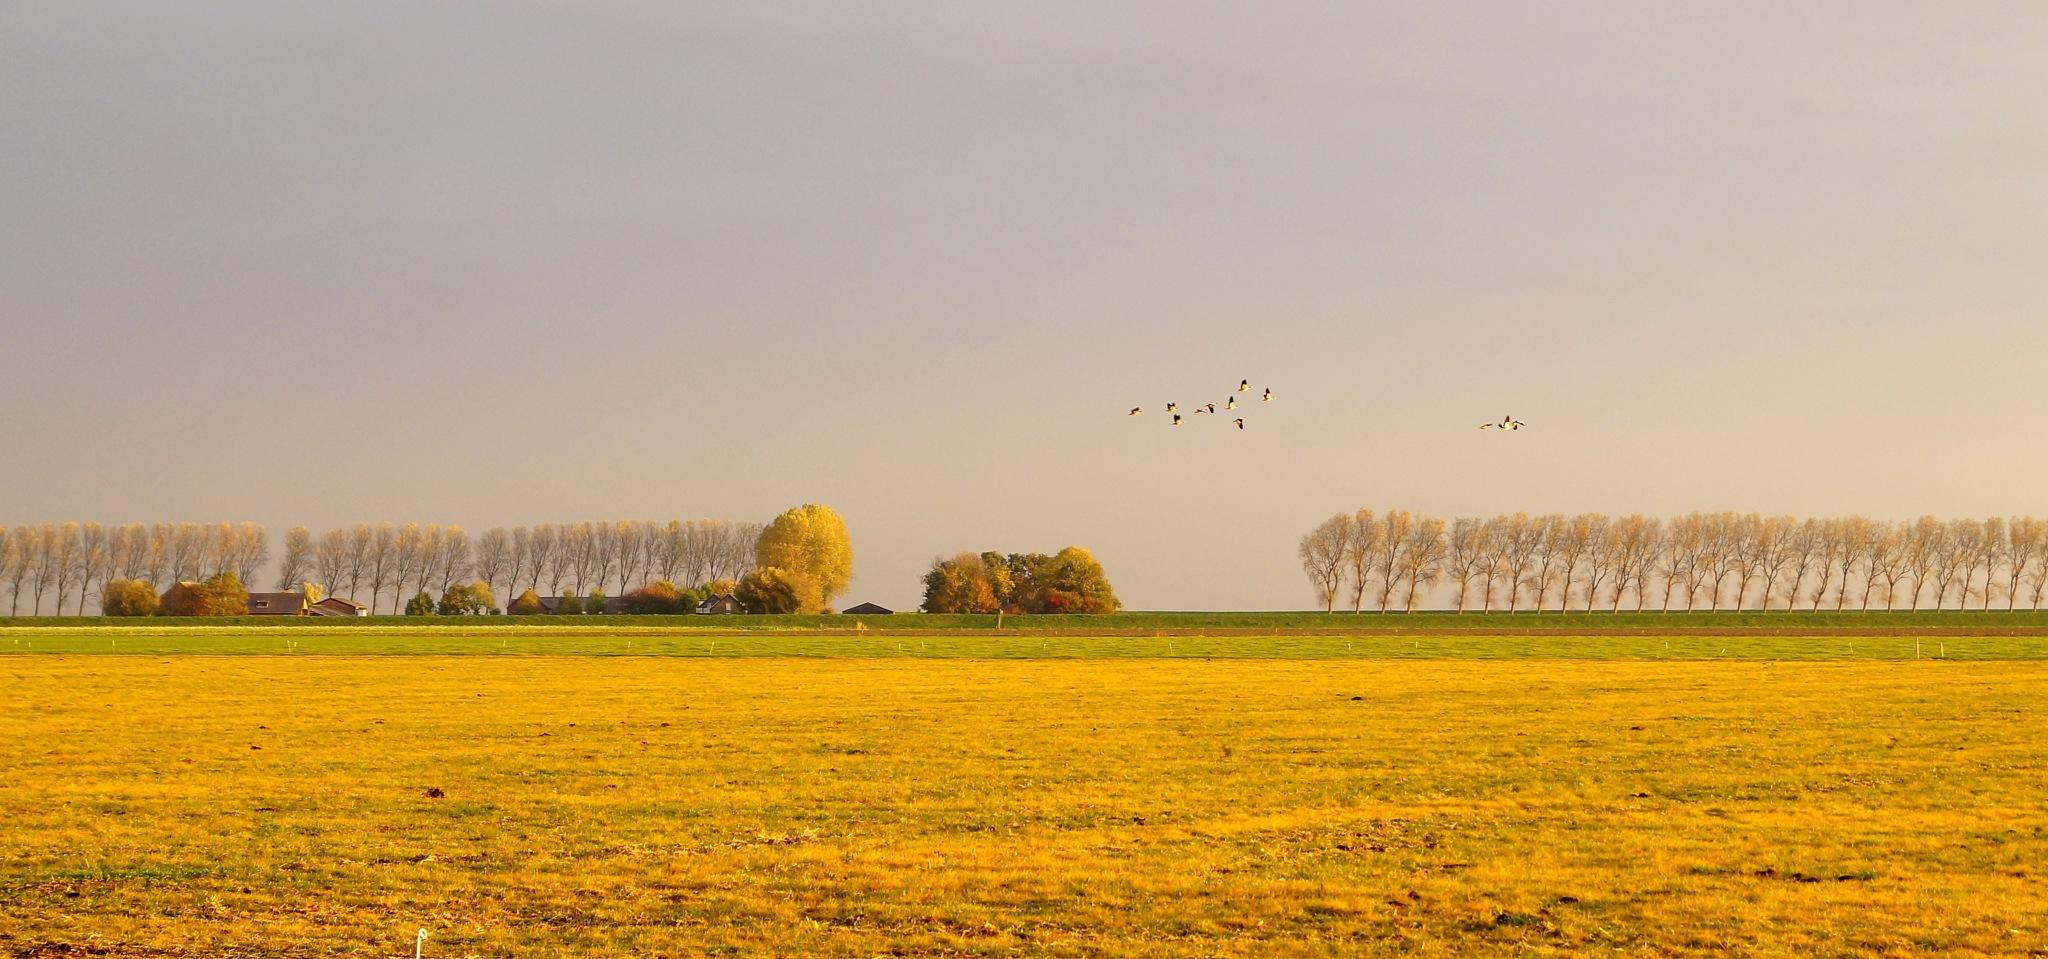 Golden Hour - Golden Landscape by Marian Baay